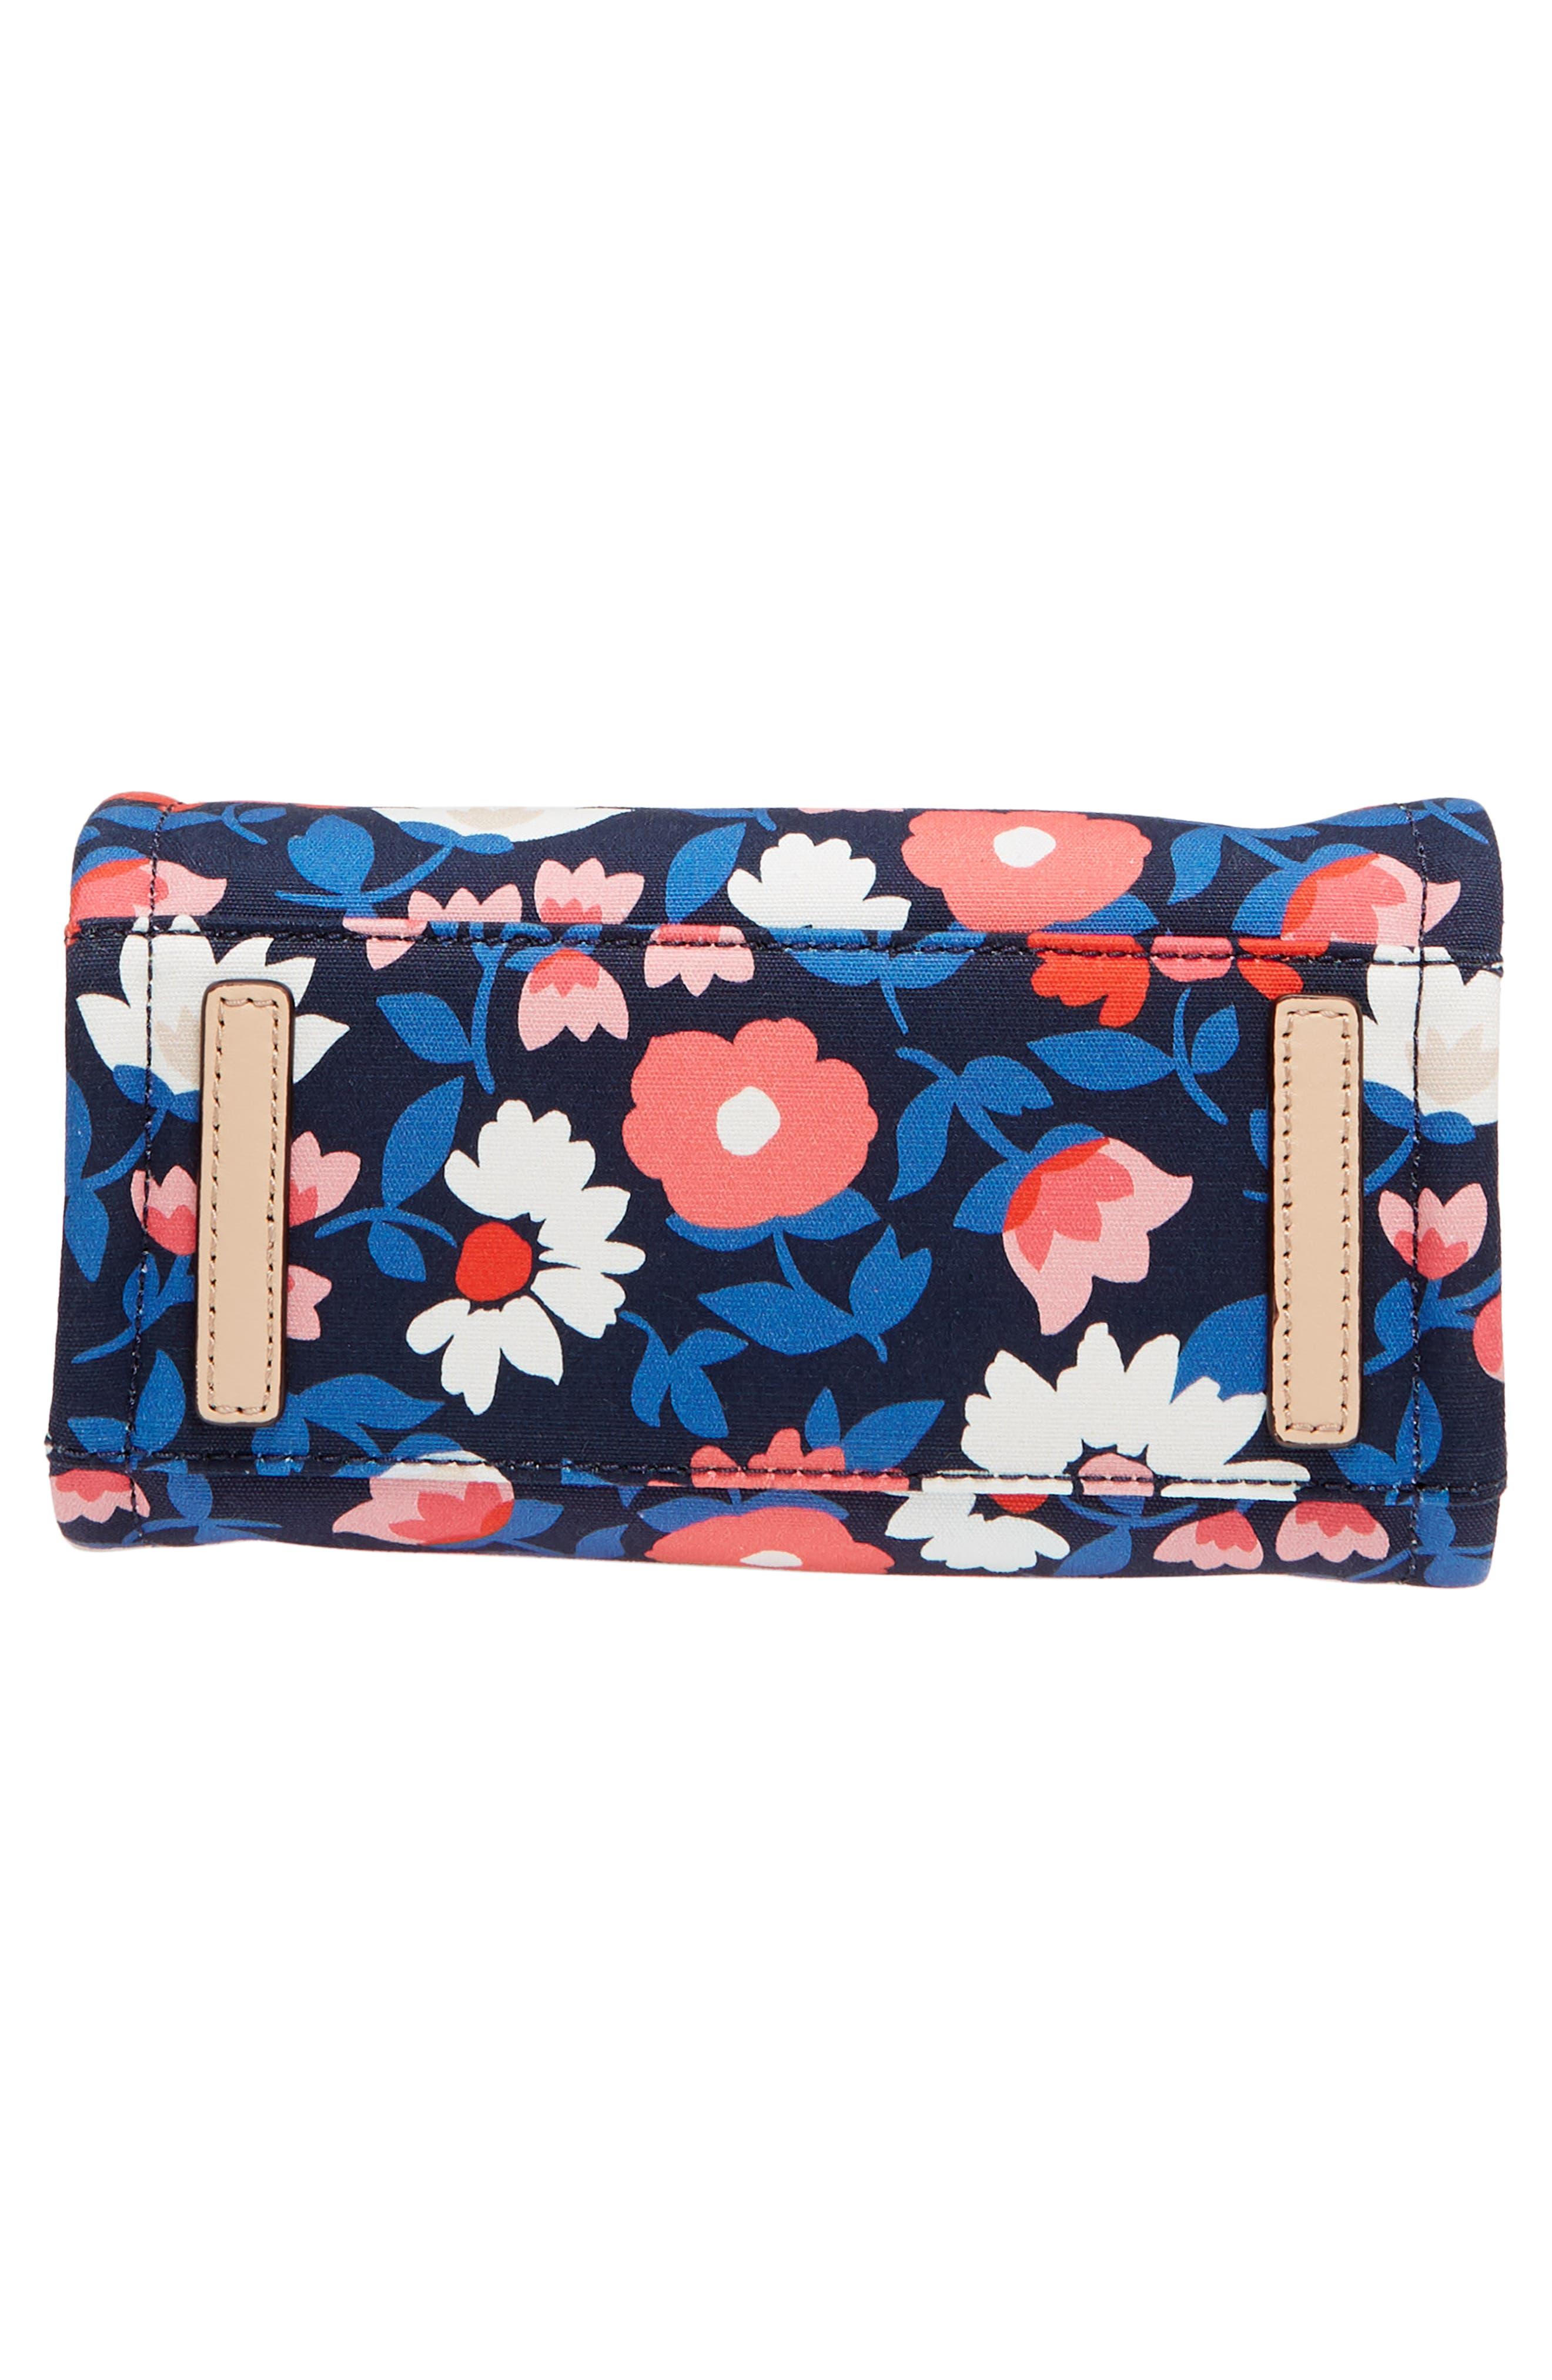 washington square - small sam canvas satchel,                             Alternate thumbnail 7, color,                             Rich Navy Multi